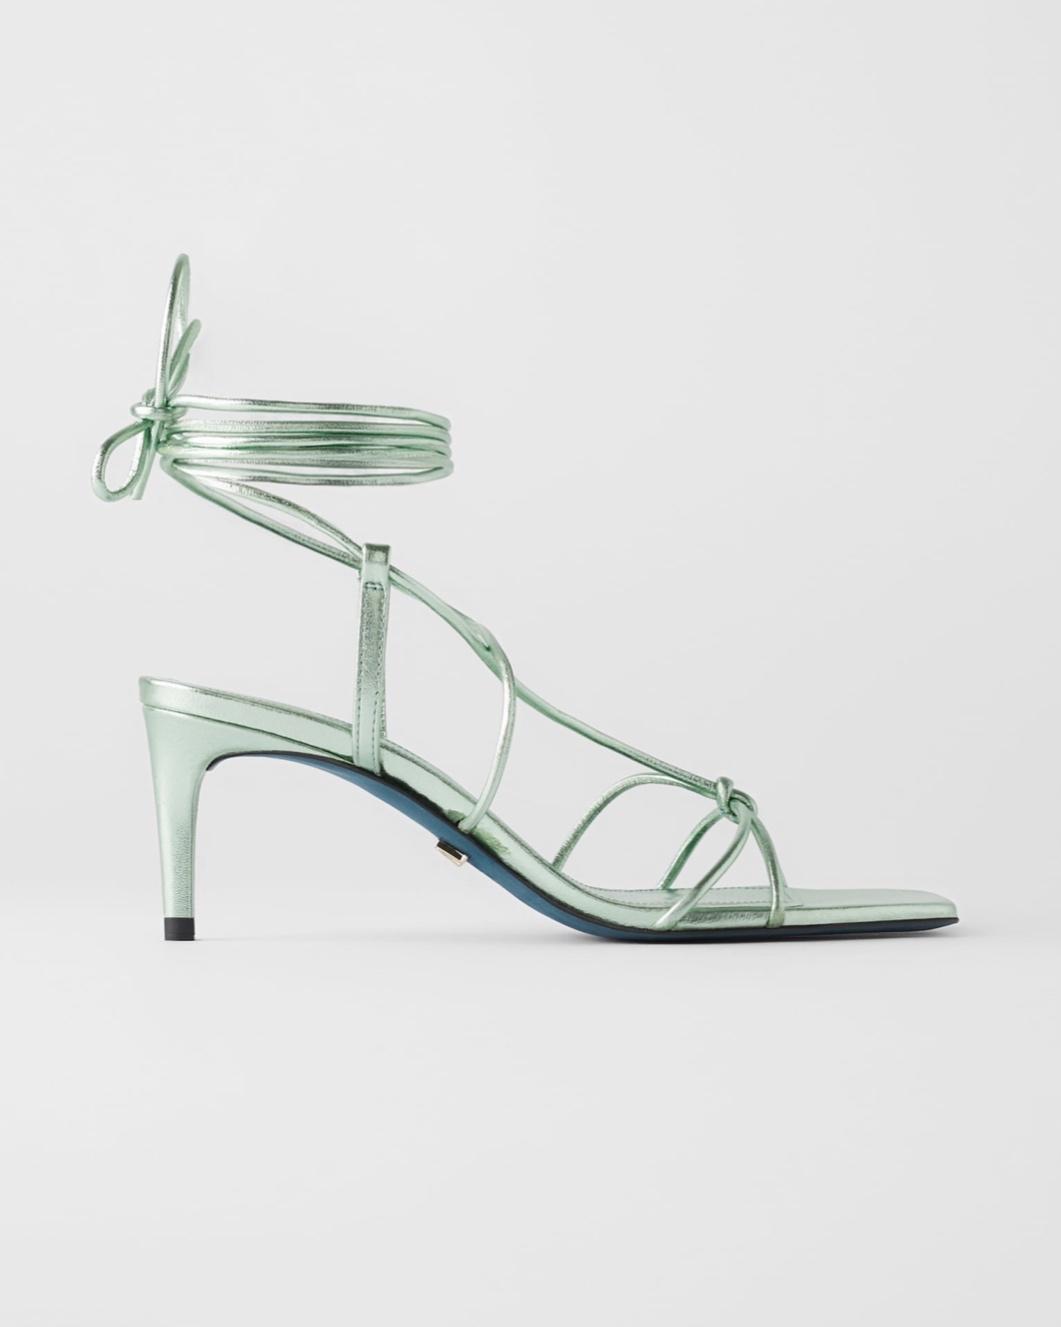 Zara Blue Collection Leather Metallic Mid Heel Shoes (£69.99)